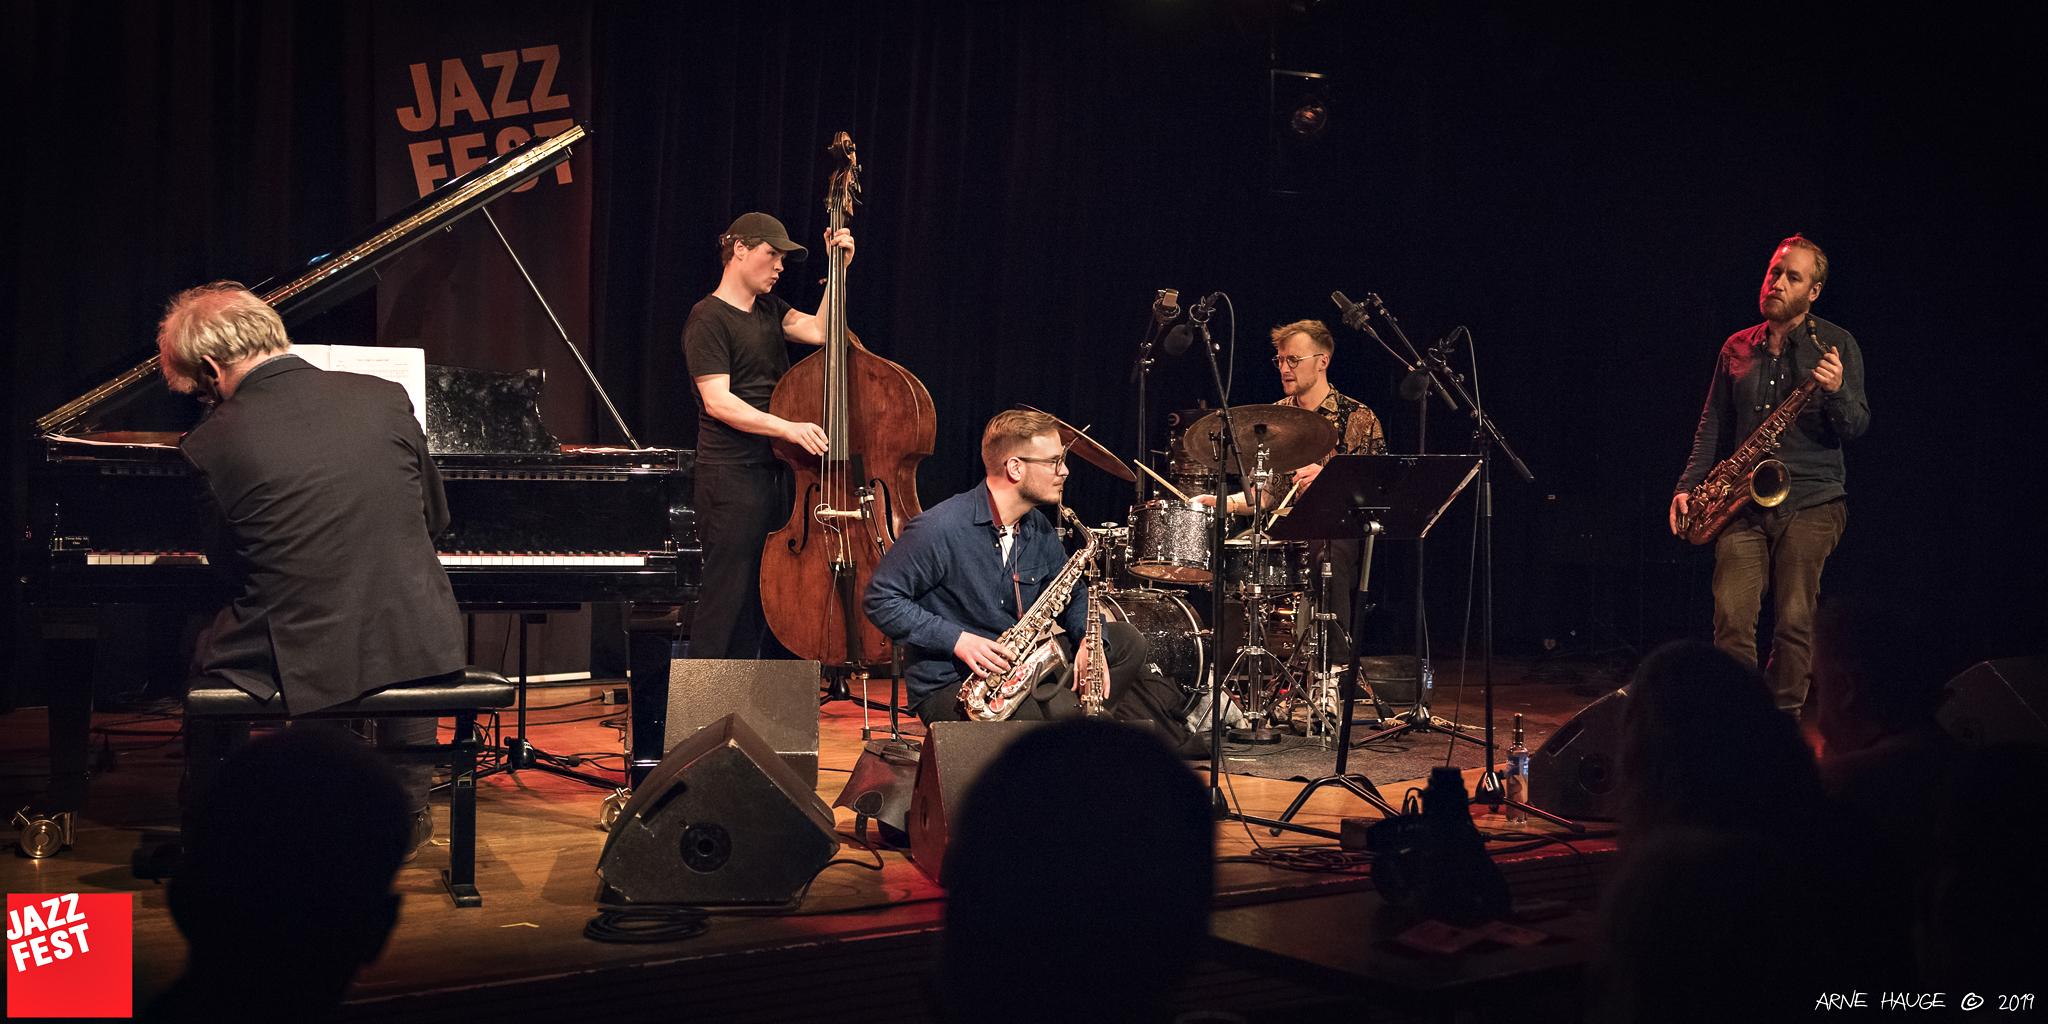 190509 Hegge (Jazz Expo) @ Dokkhuset - foto Arne Hauge_013.jpg